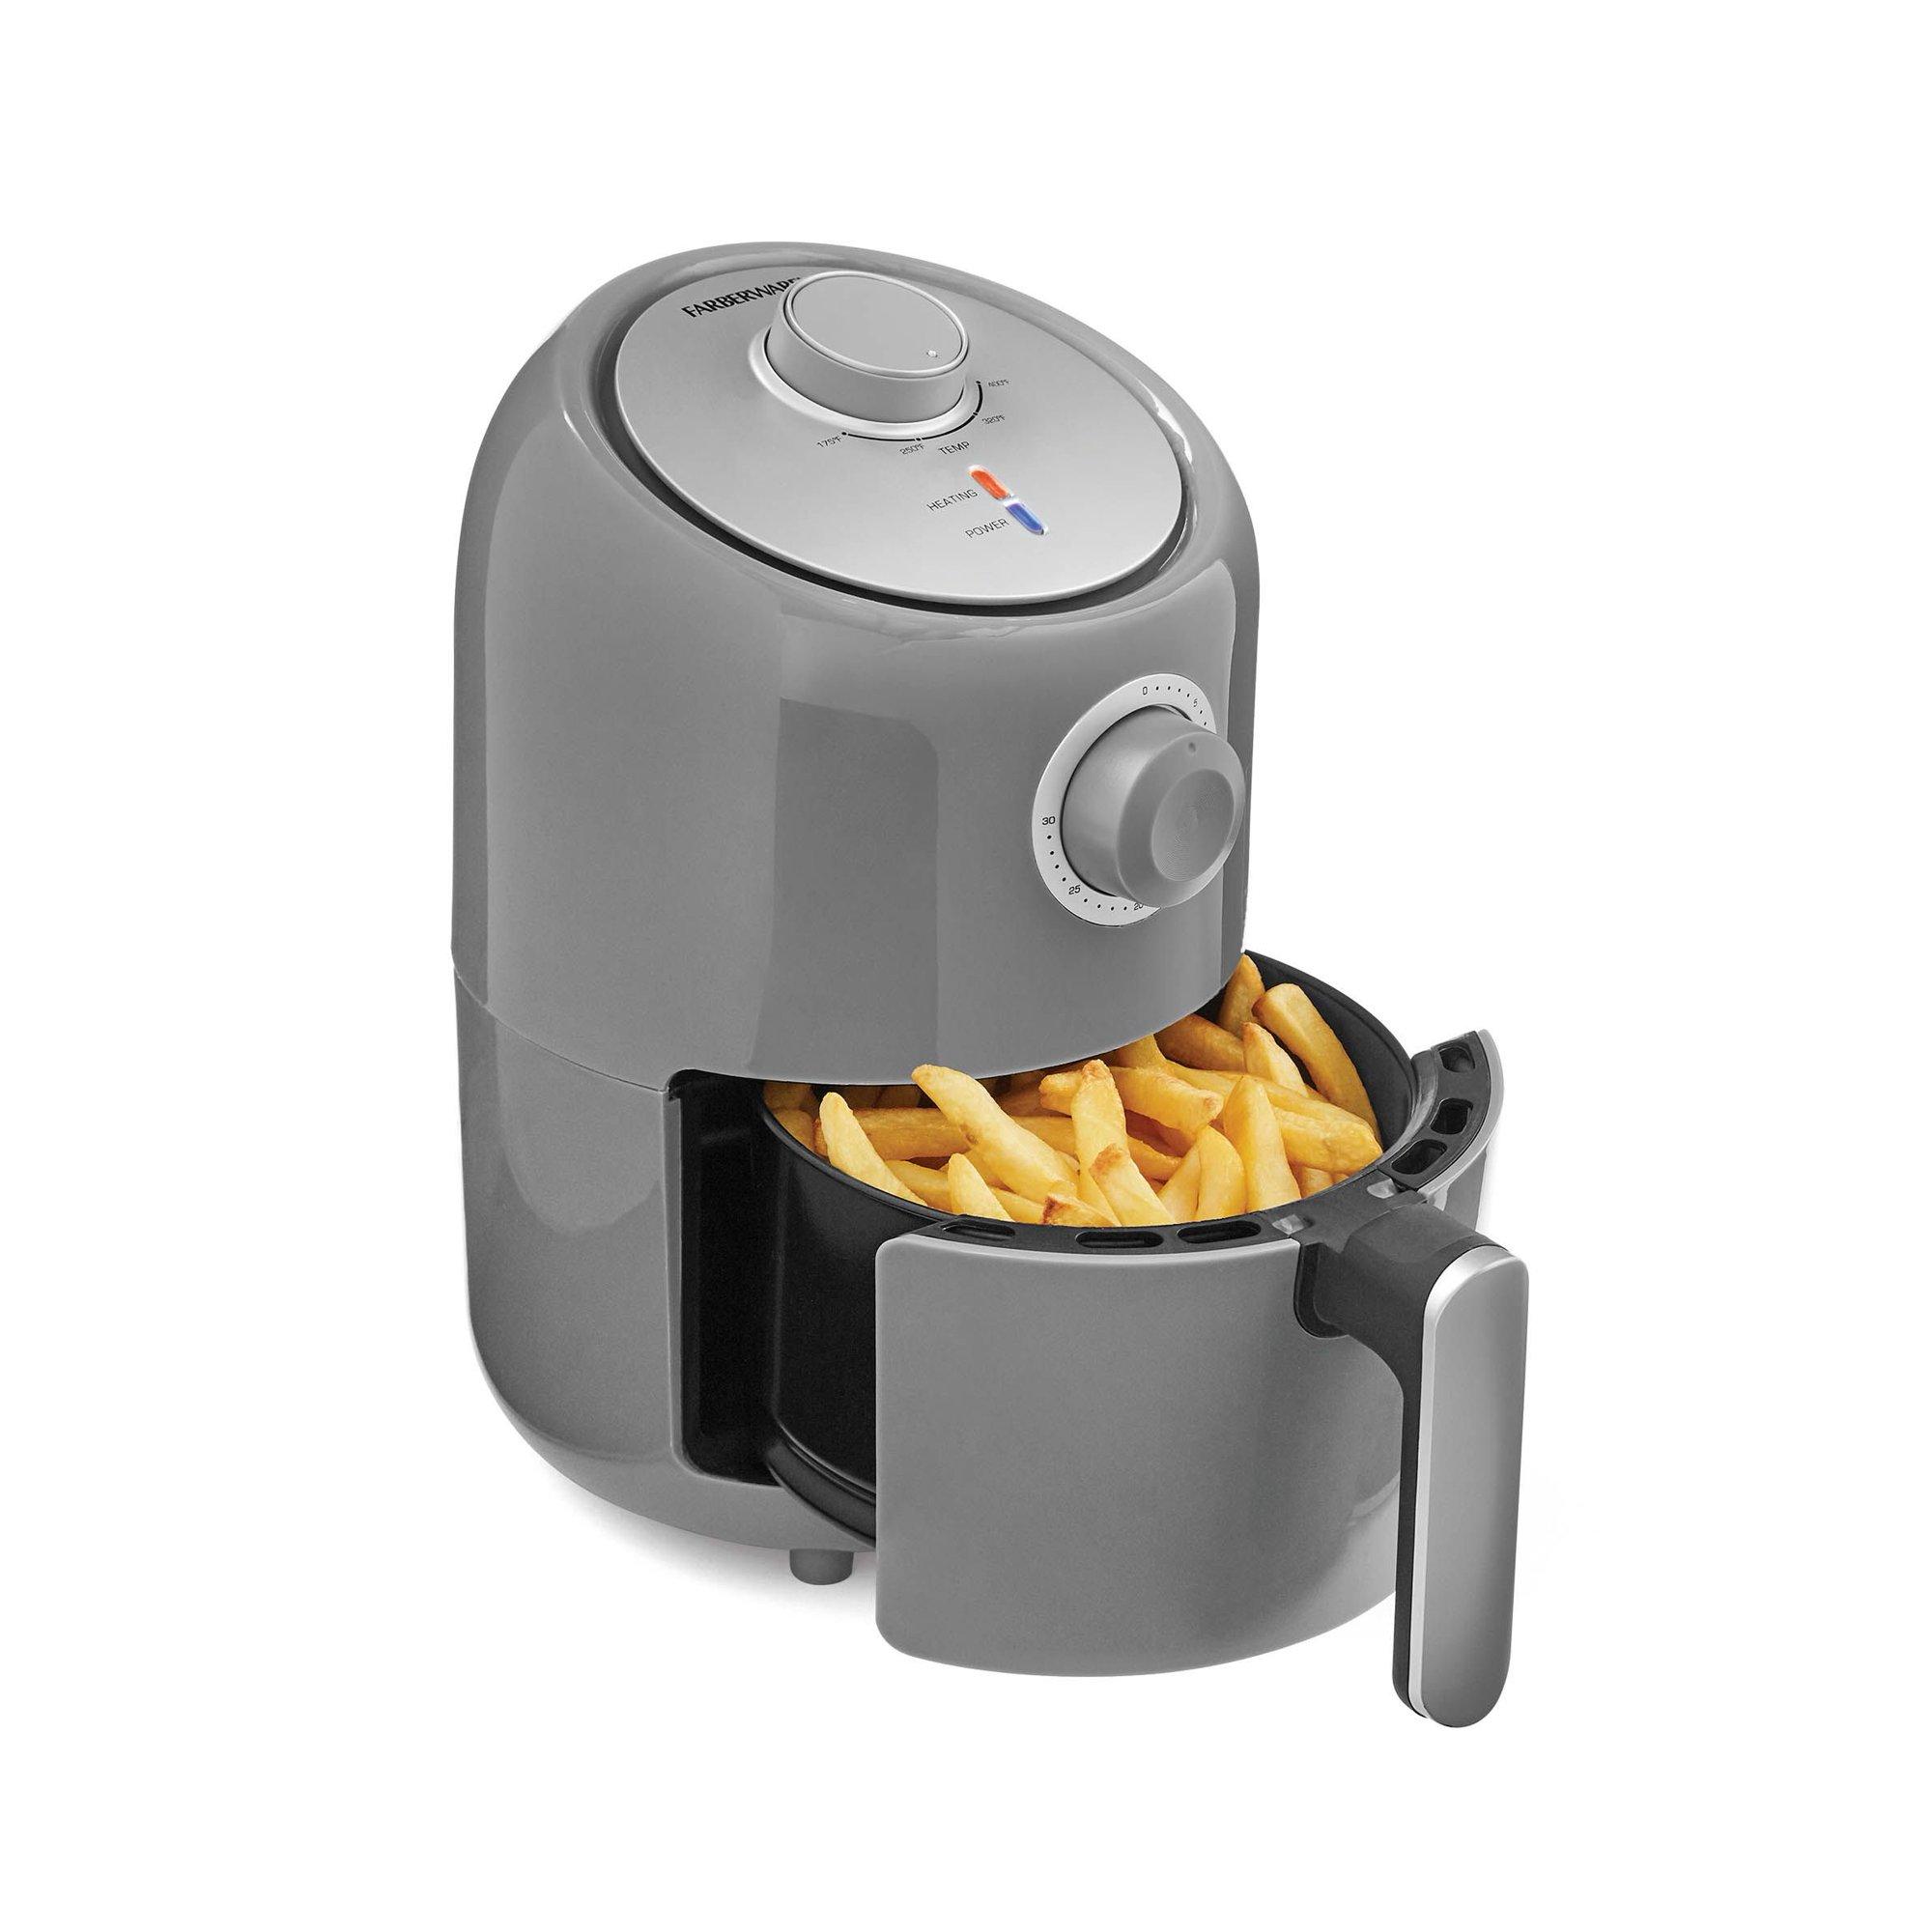 Farberware 1 9qt Air Fryer Grey 29 88